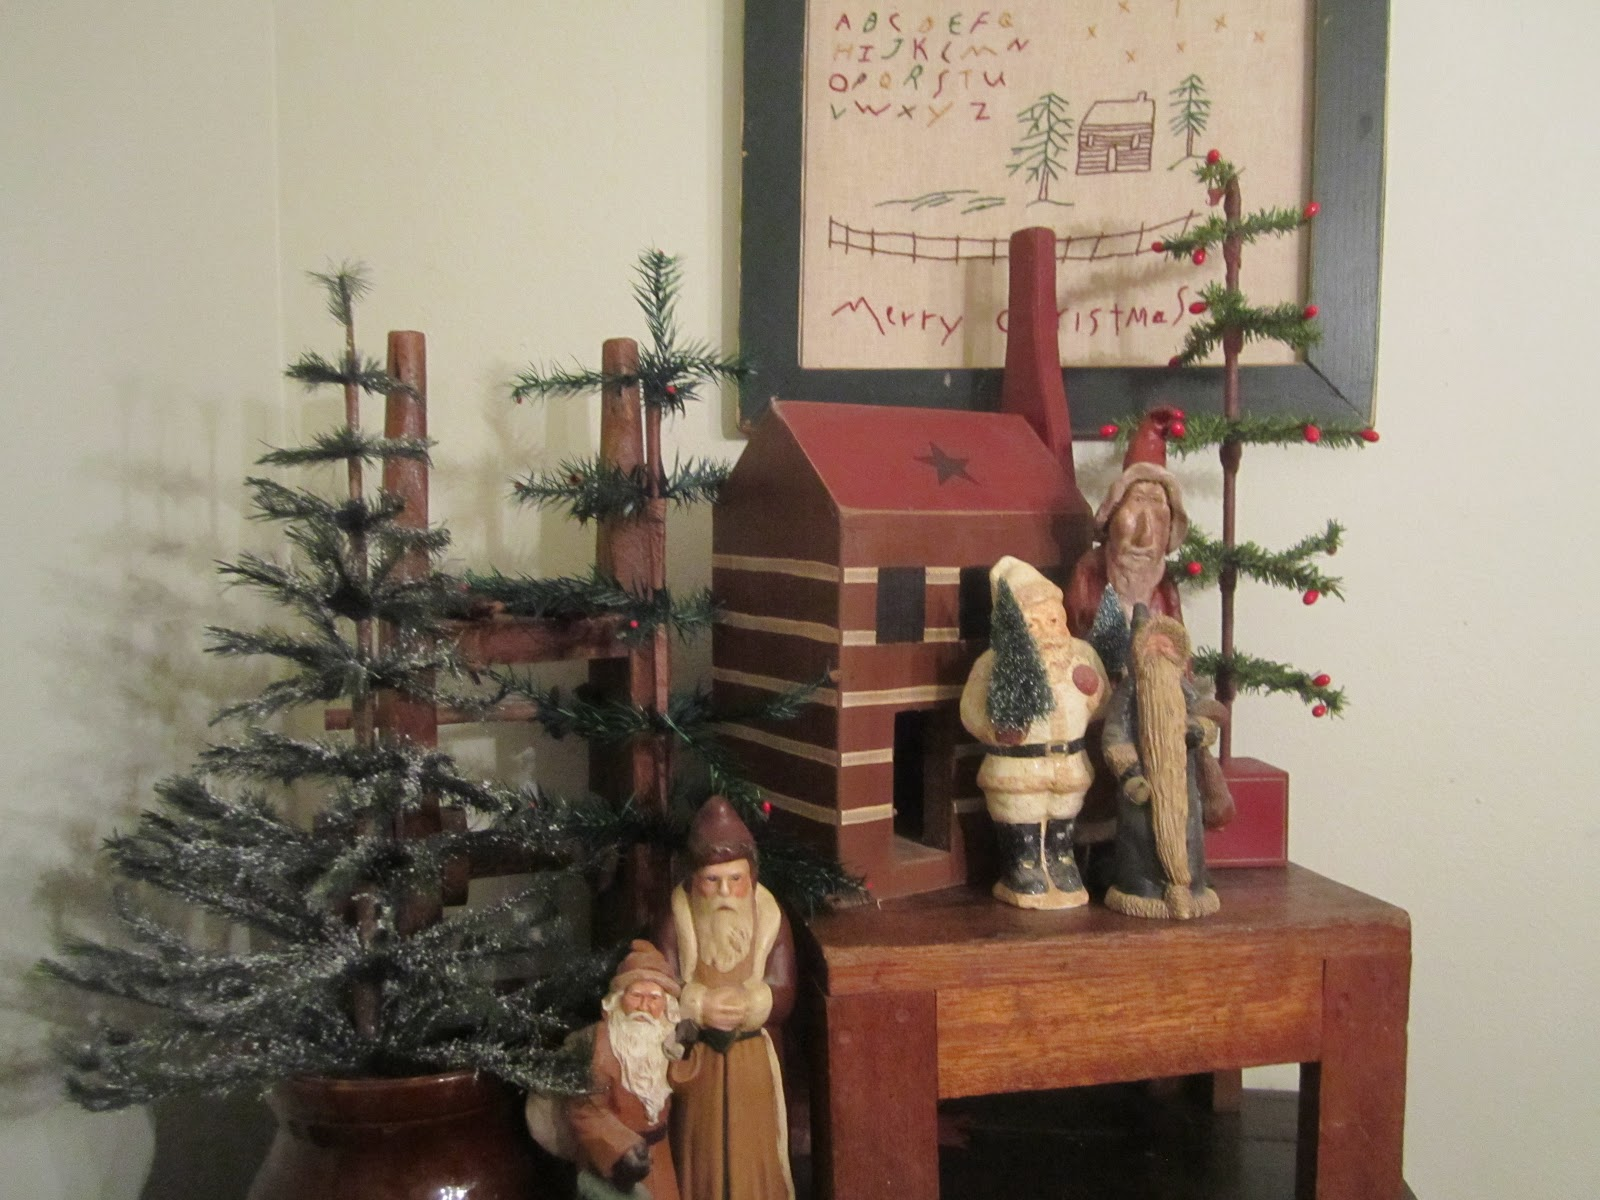 Http Woolcrazy Jam Blogspot Com 2012 11 Primitive Christmas Blog Html